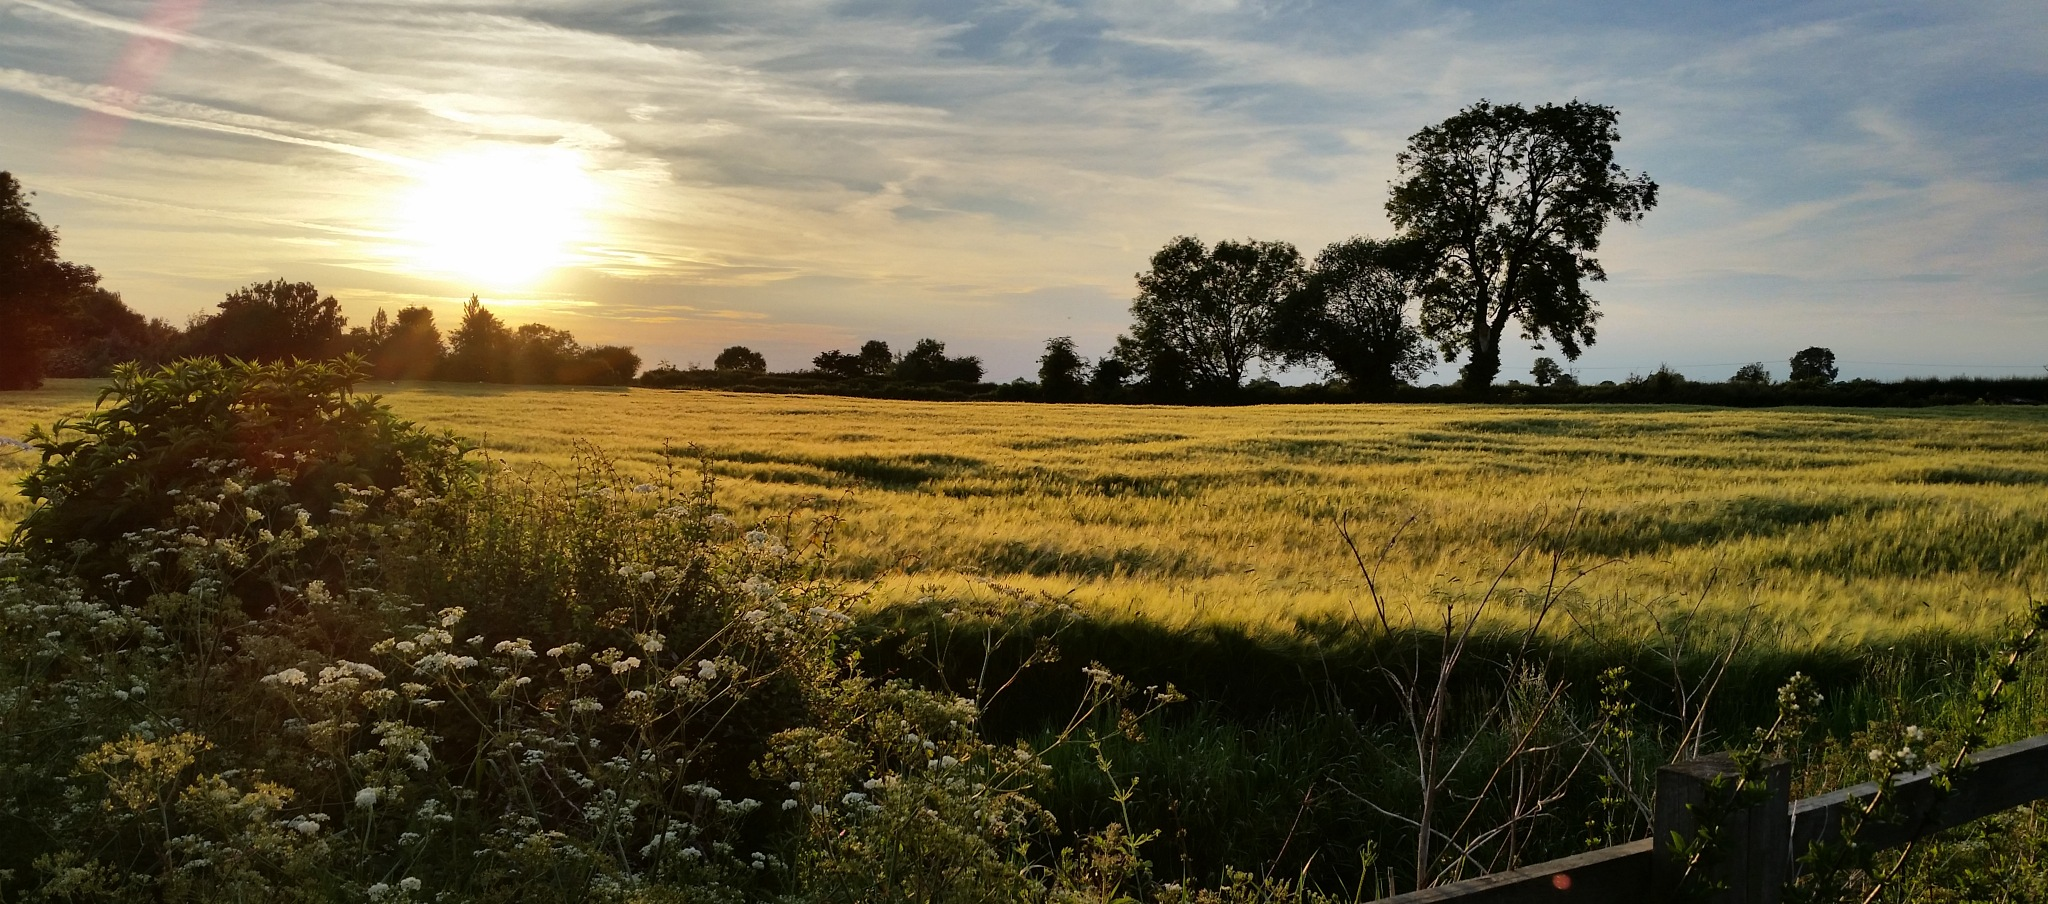 Barley Sunset by neiloswaldjones